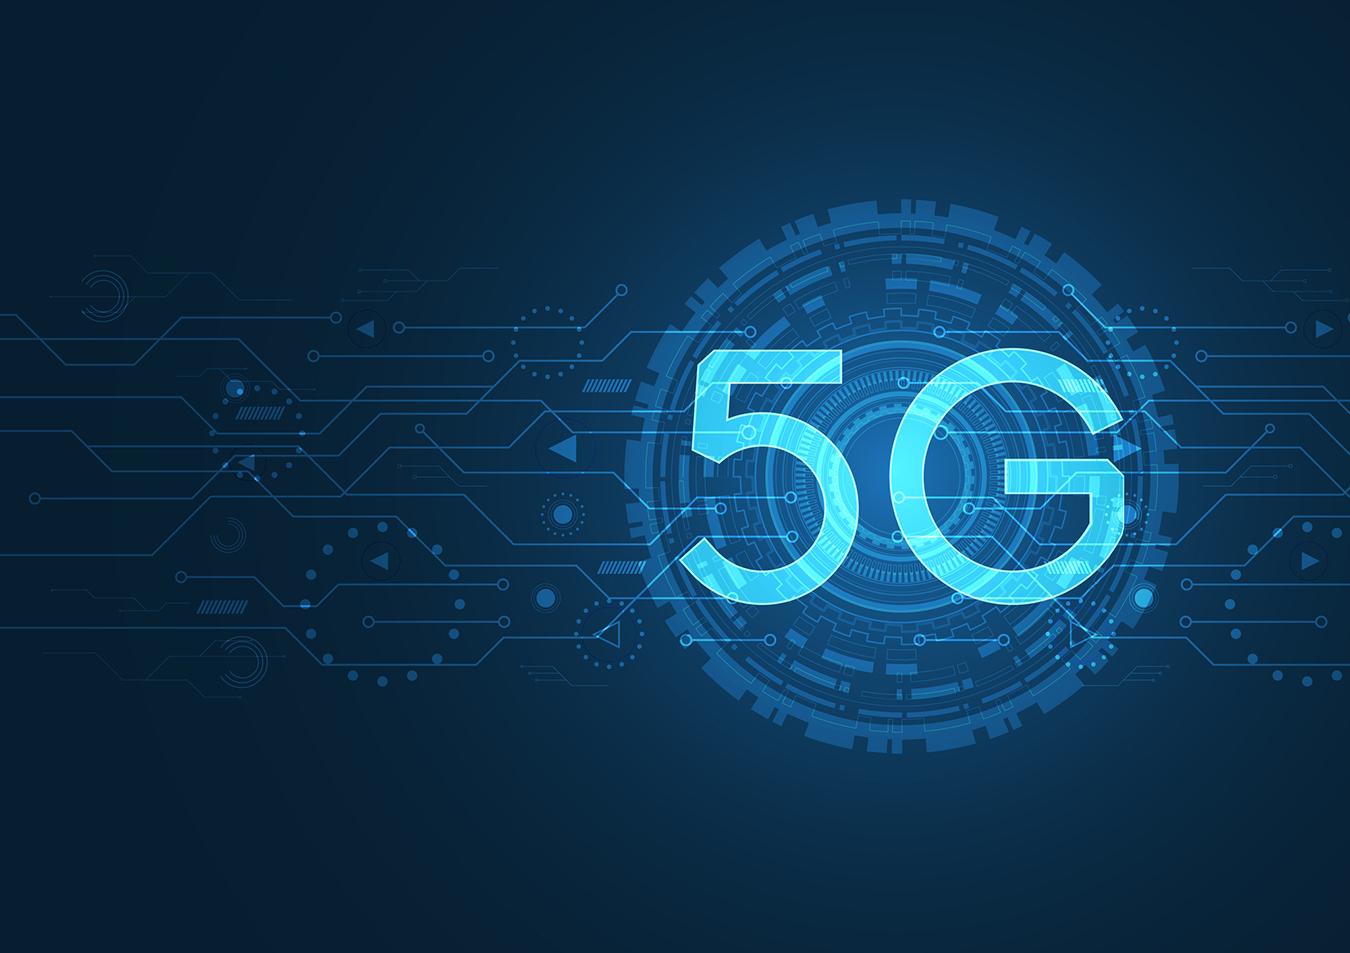 5Gの普及には何が必要か?~日本の現状と今後の方向性